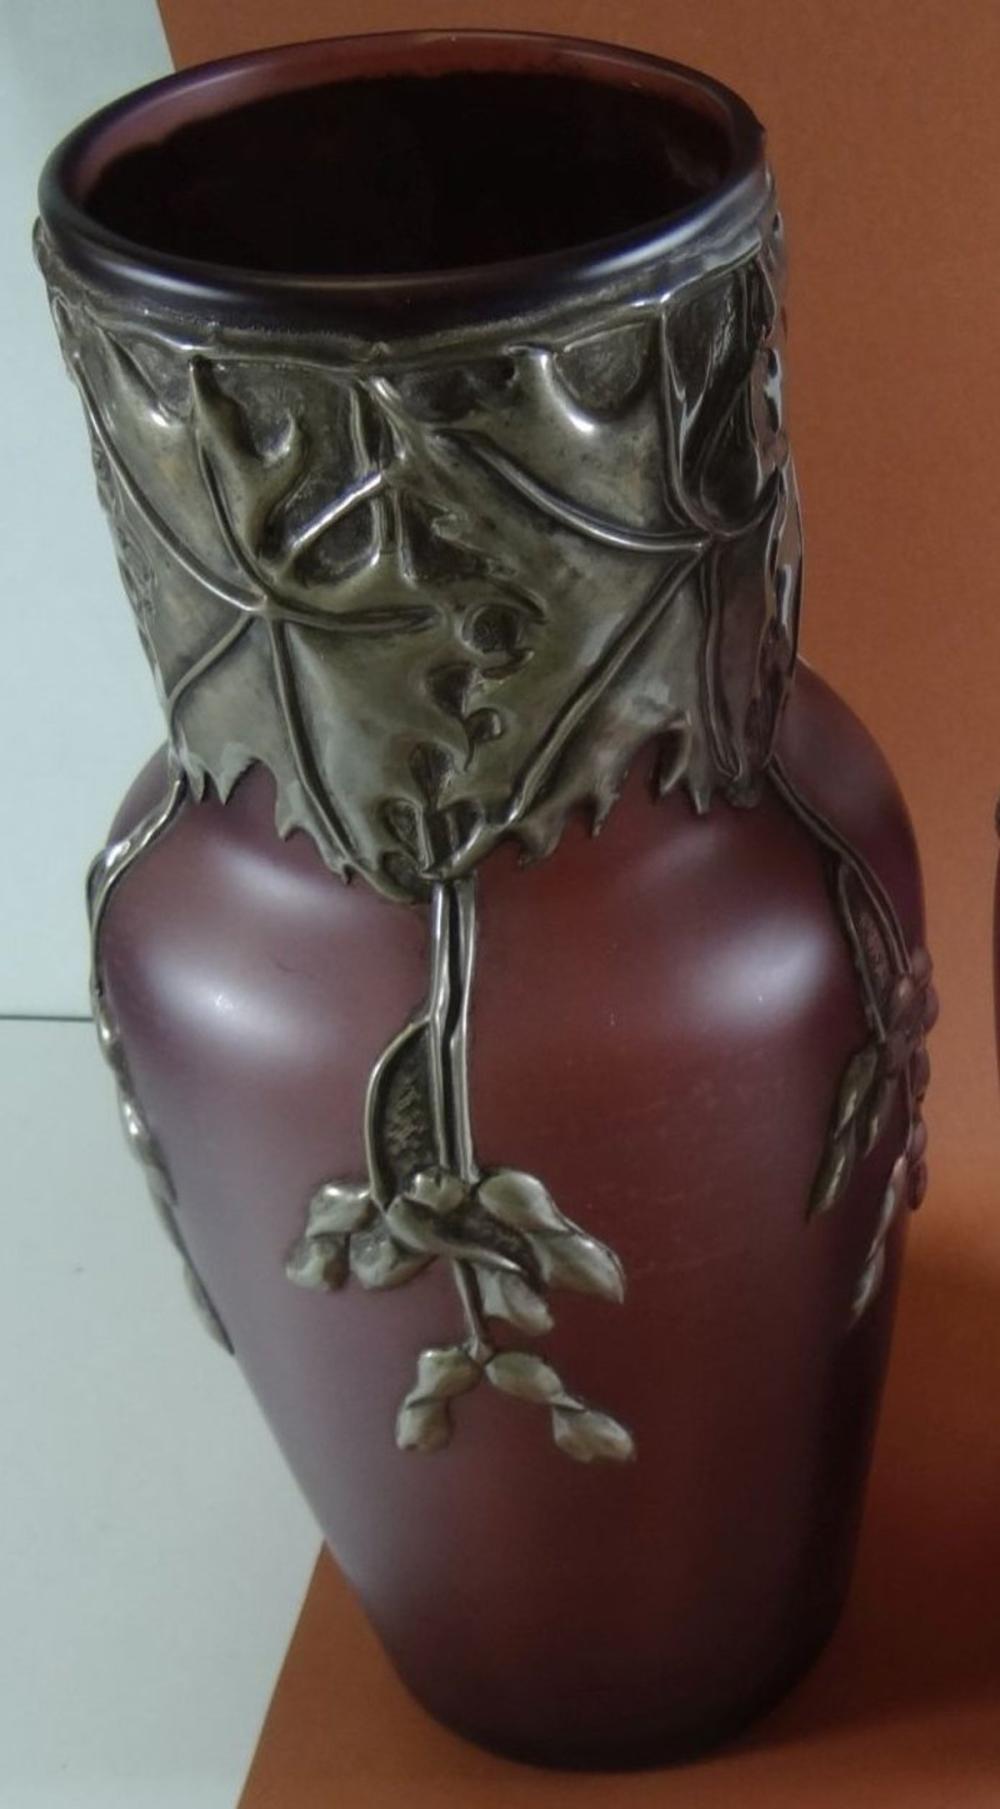 Jugendstil-Vase mit Zinnmontur, lila, Blätterdekor,